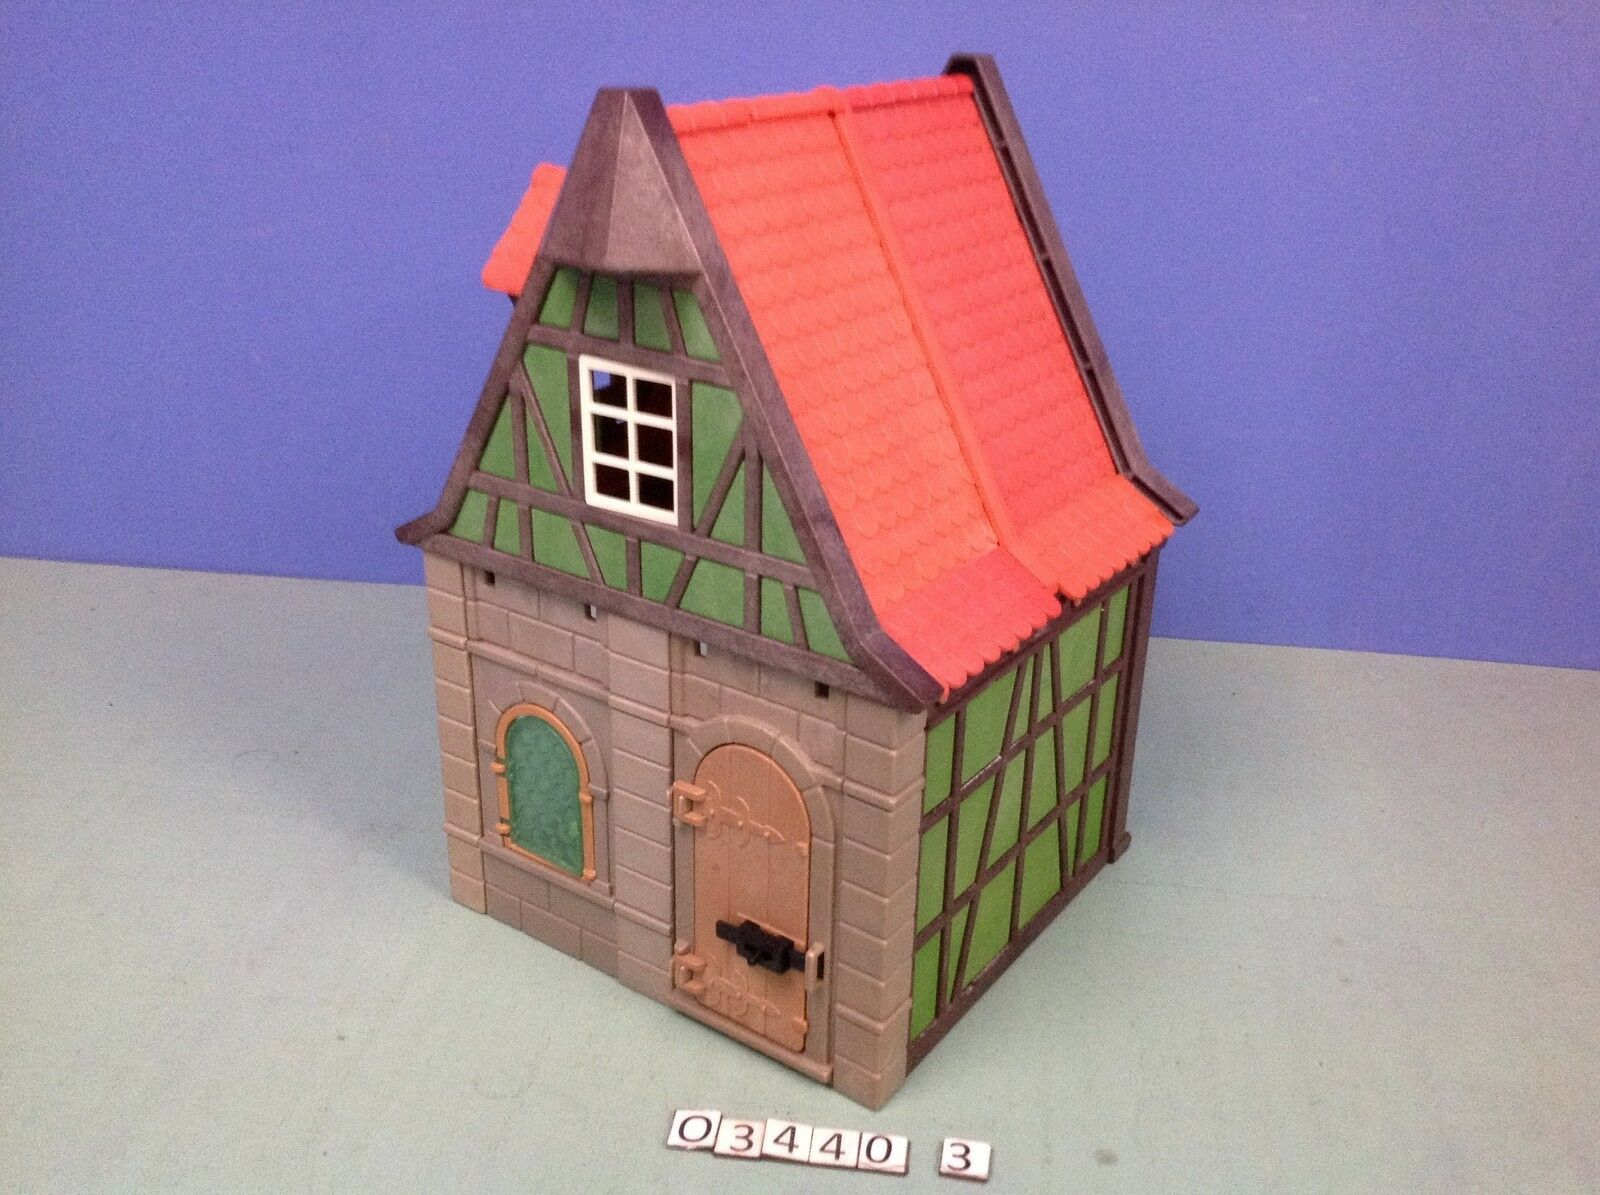 (O3440.3) playmobil maison médiévale Grüne le Größeur ref 3440 3666